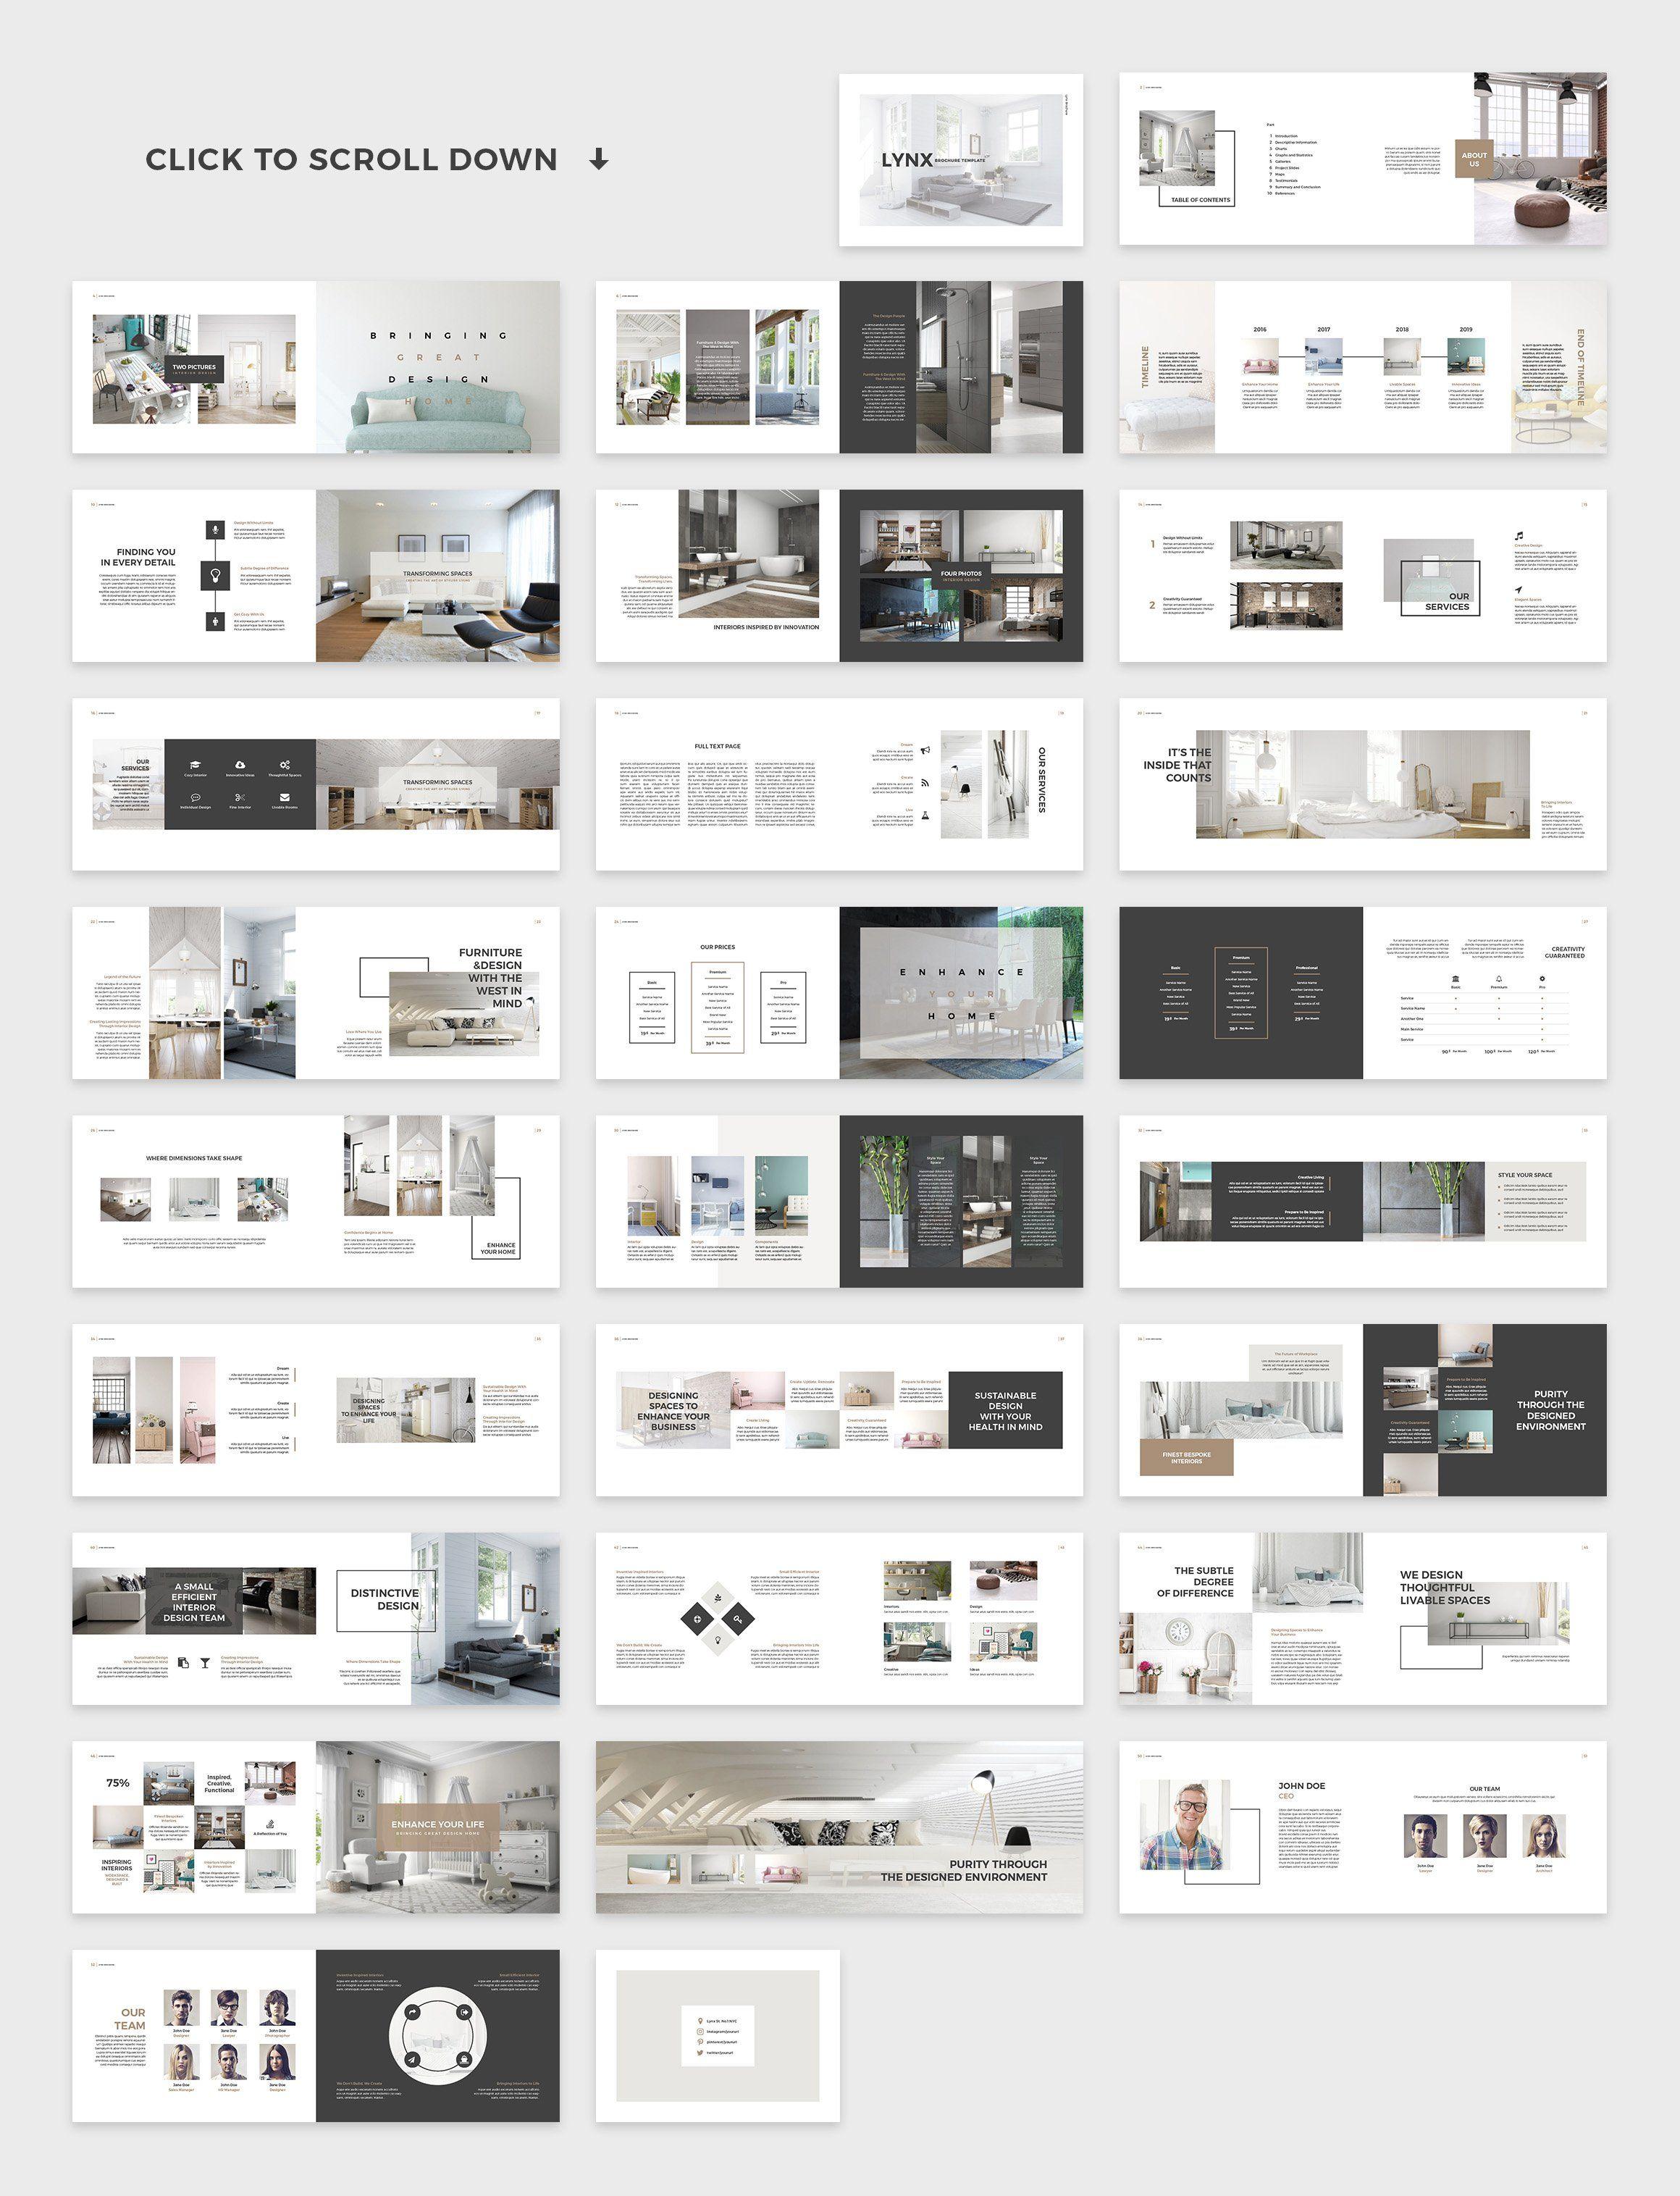 Lynx Brochure Template Interior Design Template Architecture Portfolio Layout Catalog Design Layout